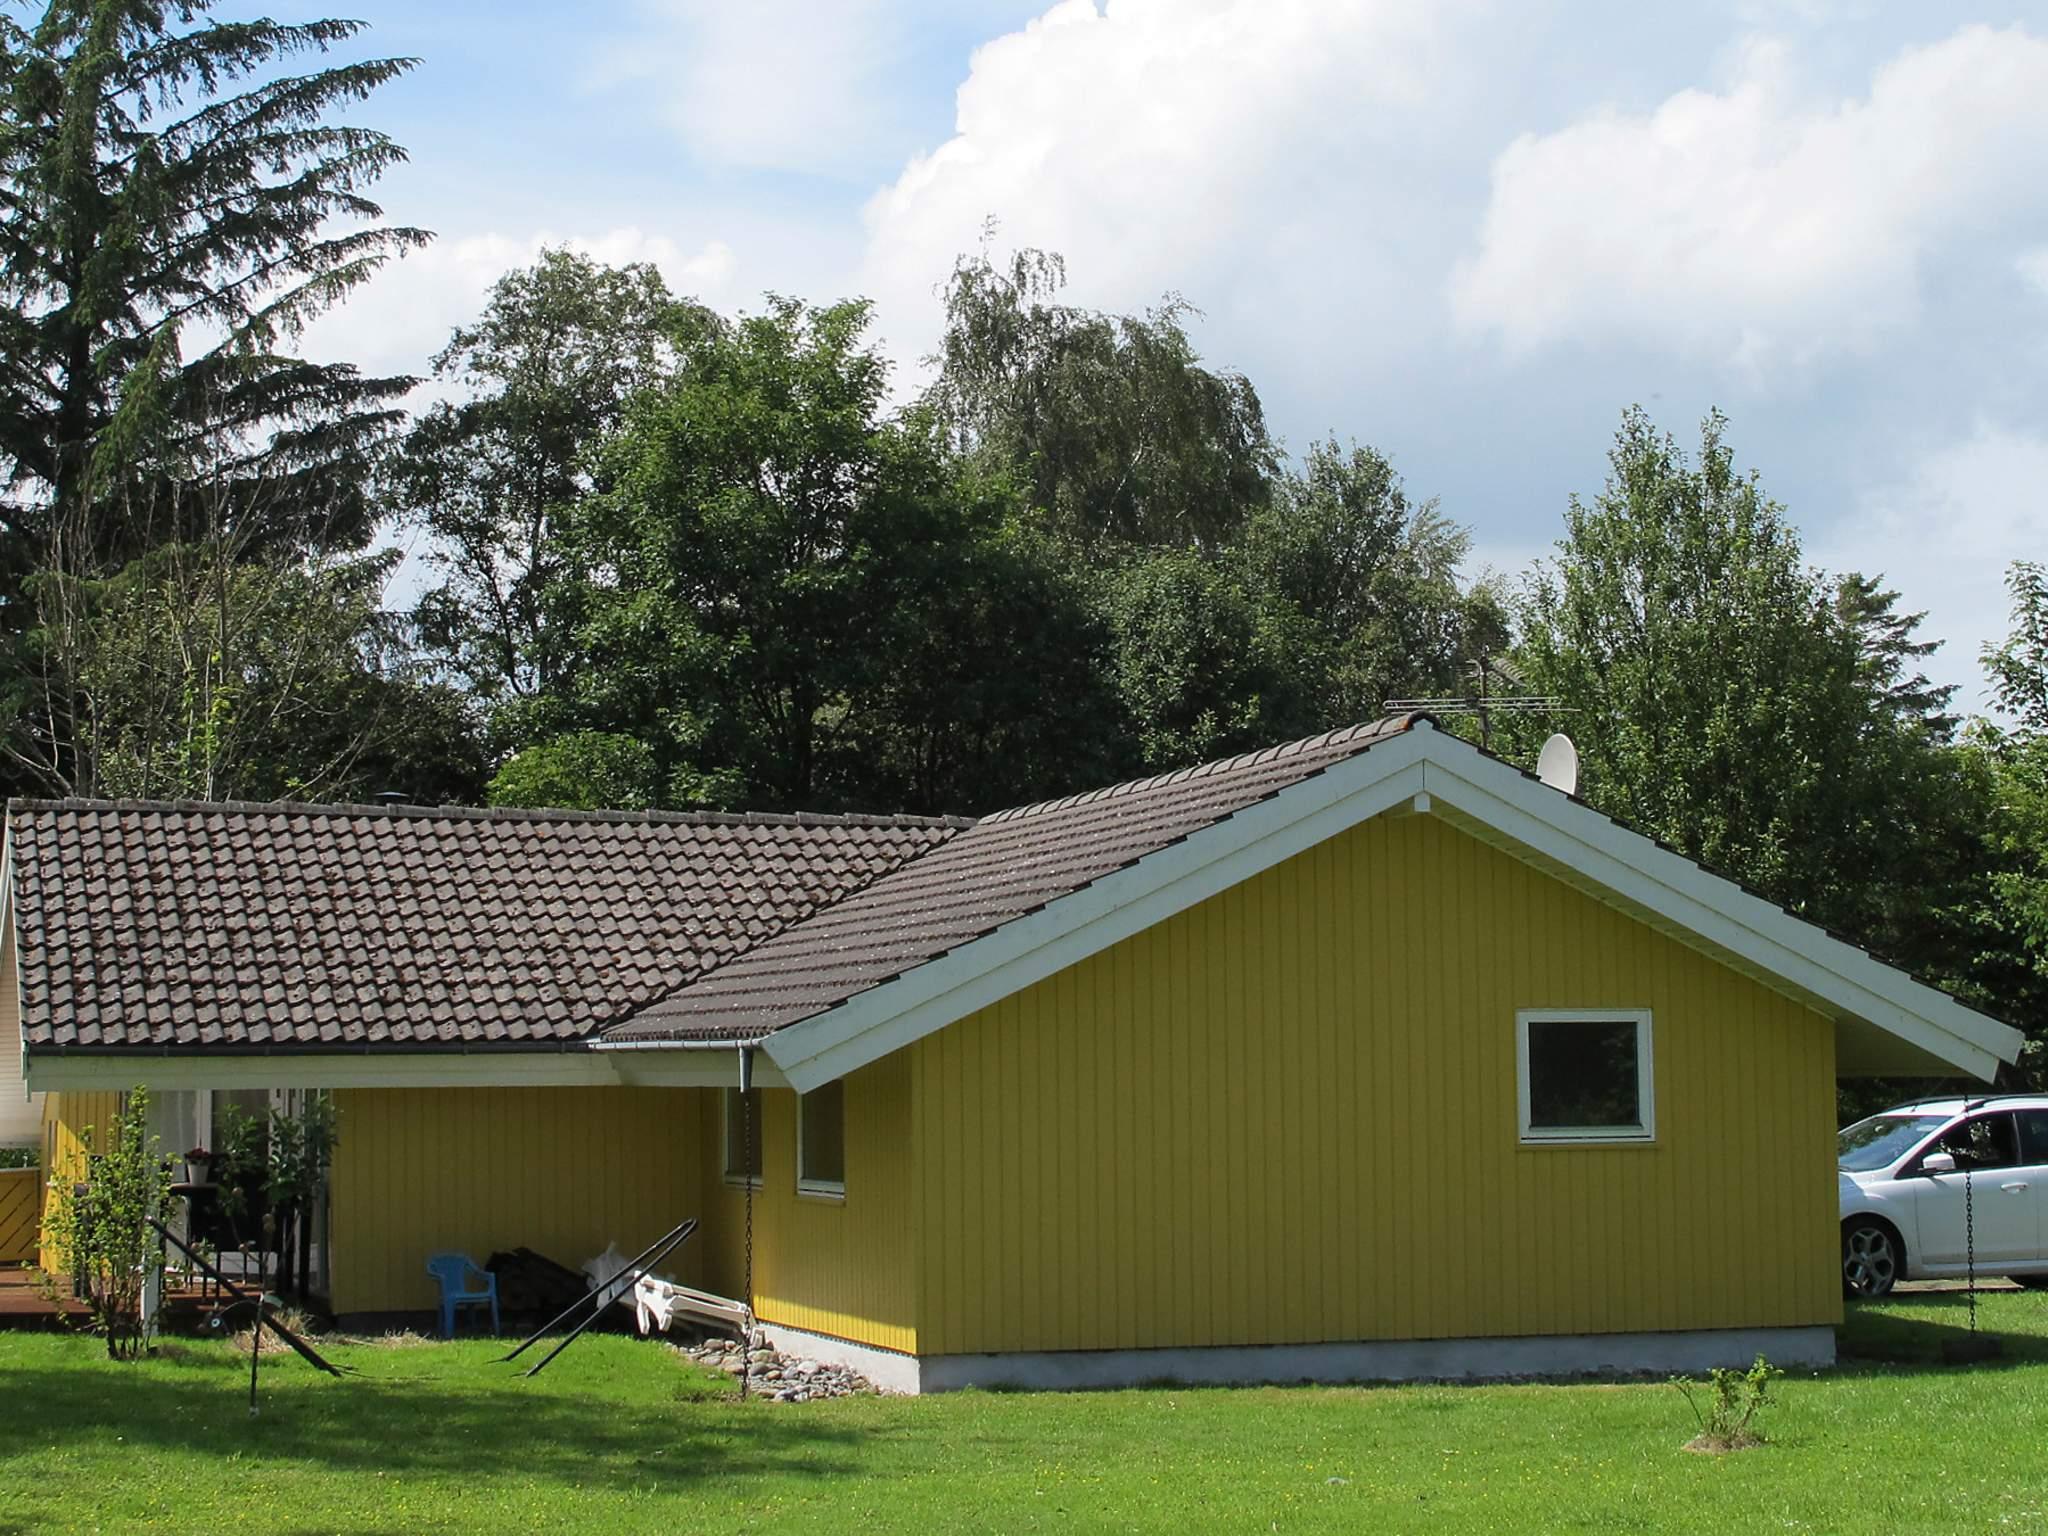 Ferienhaus Råbylille Strand (87316), Råbylille, , Møn, Dänemark, Bild 17